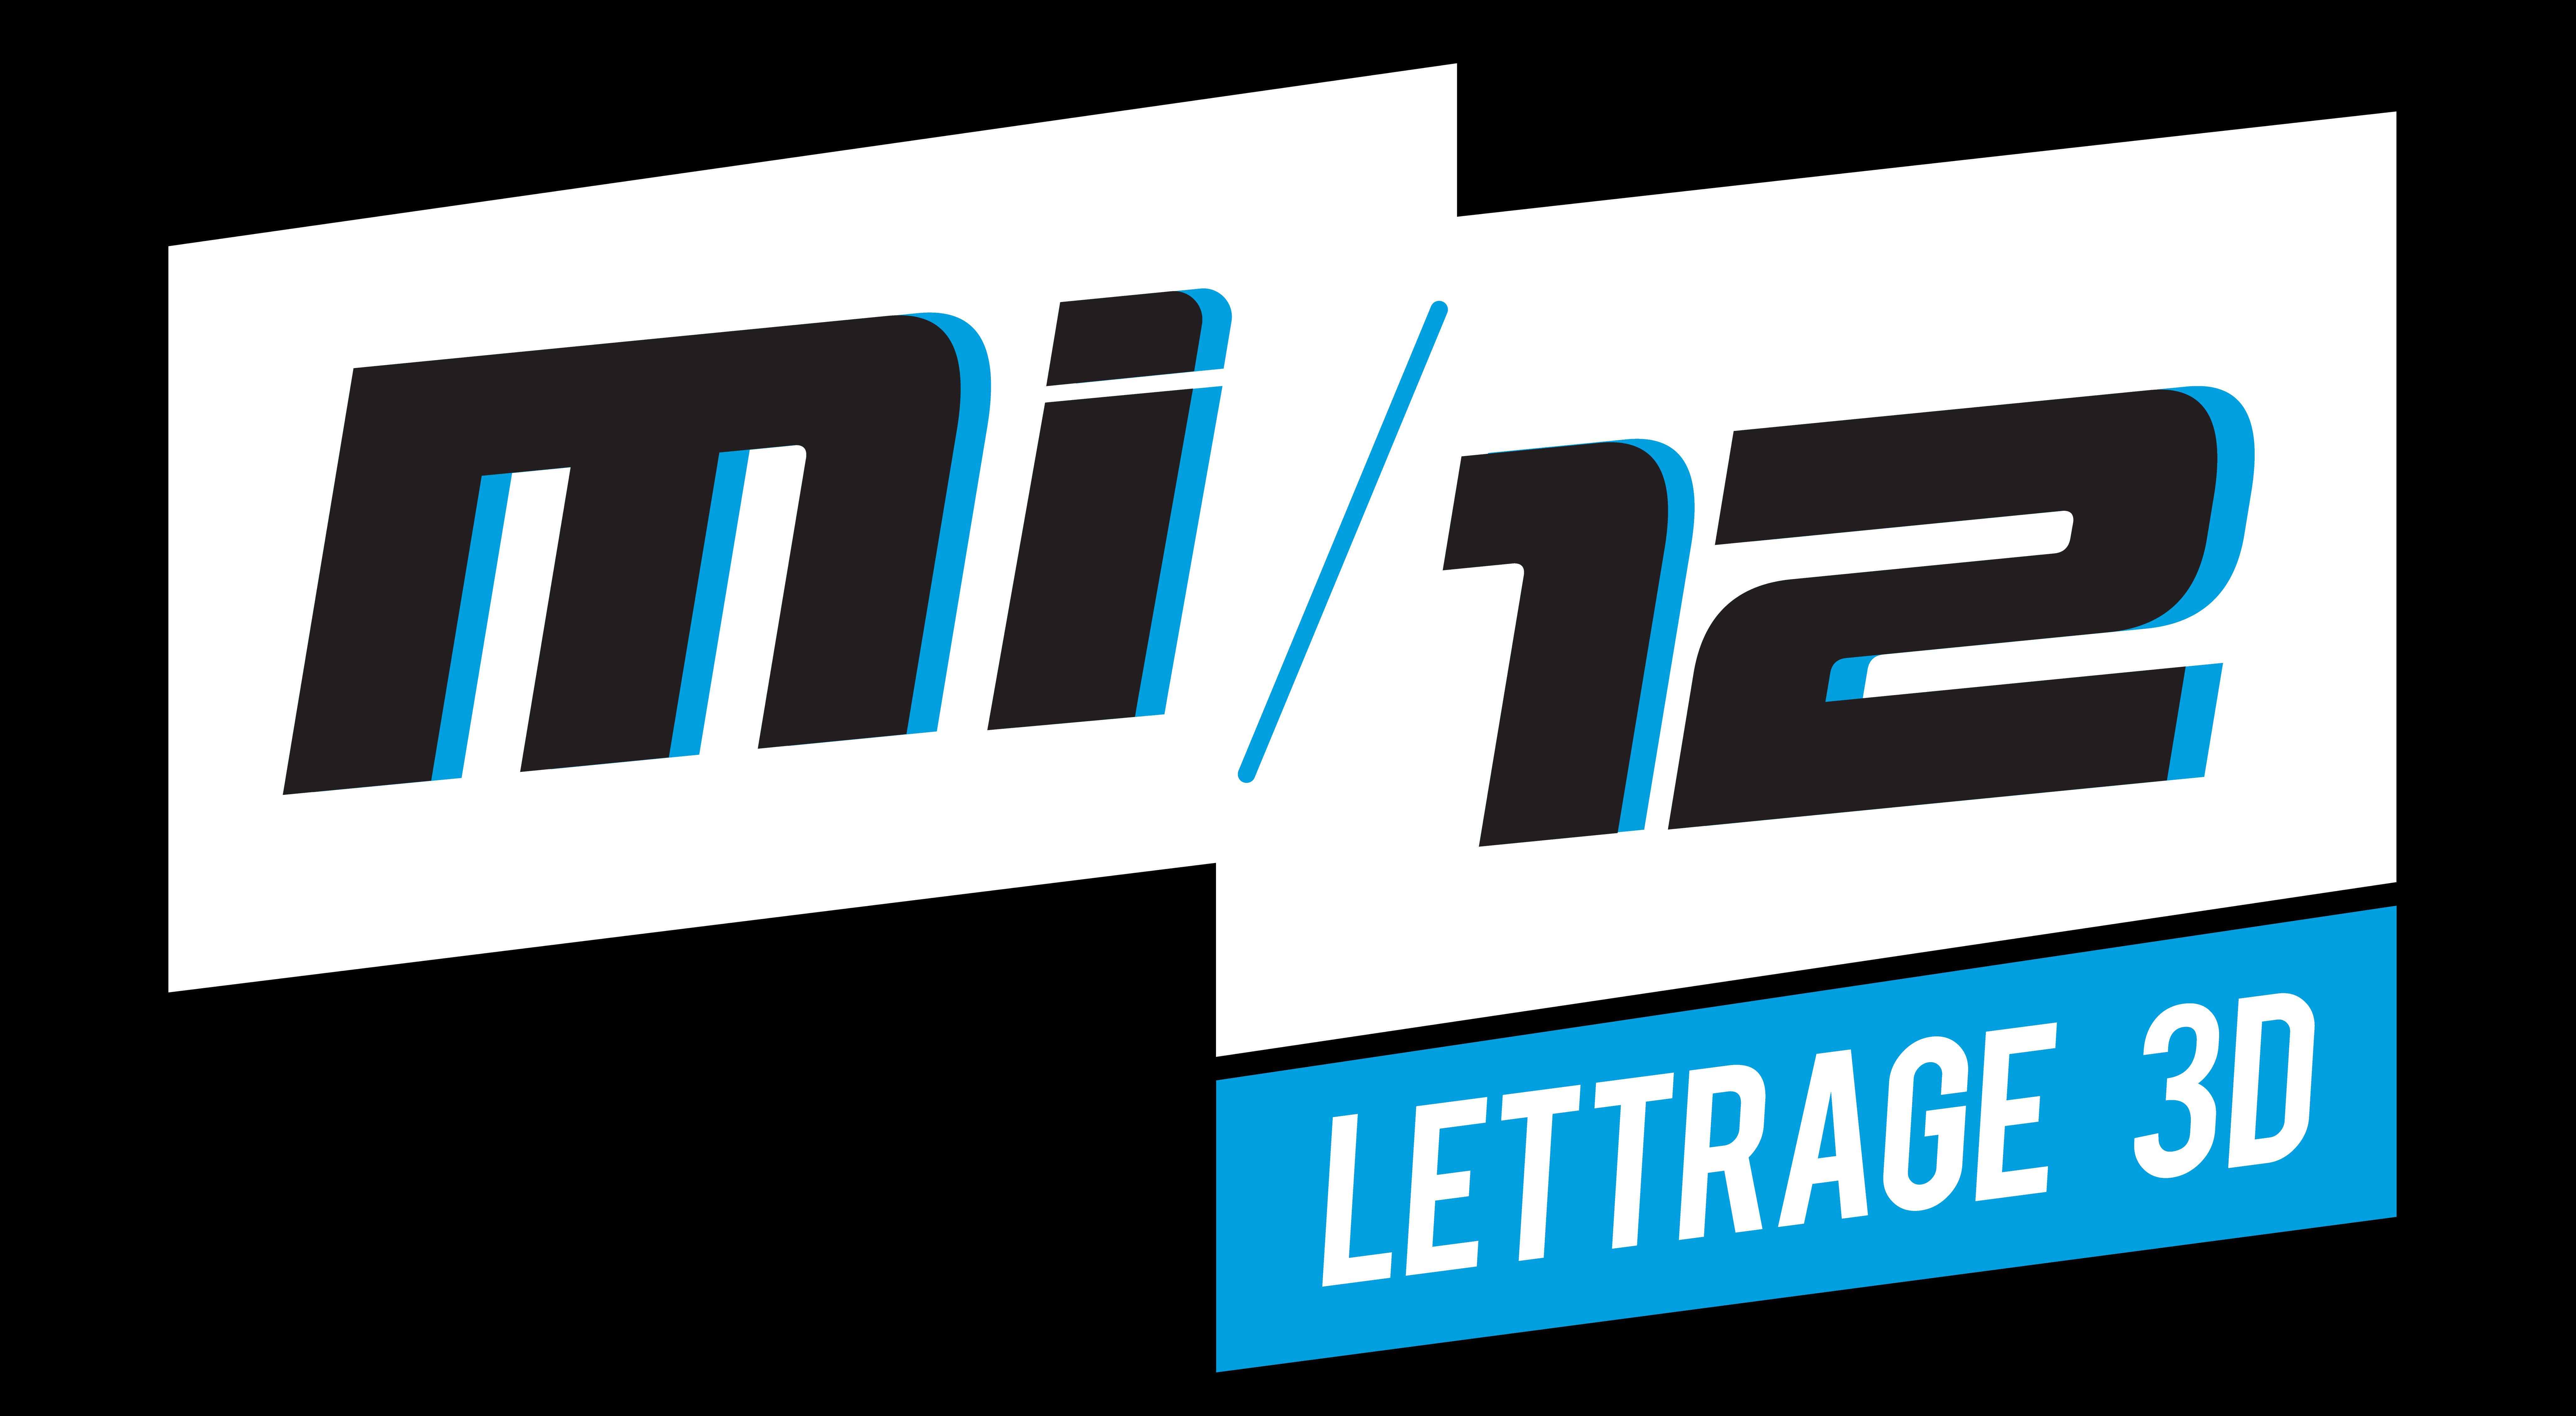 Lettrage 3D MI-12